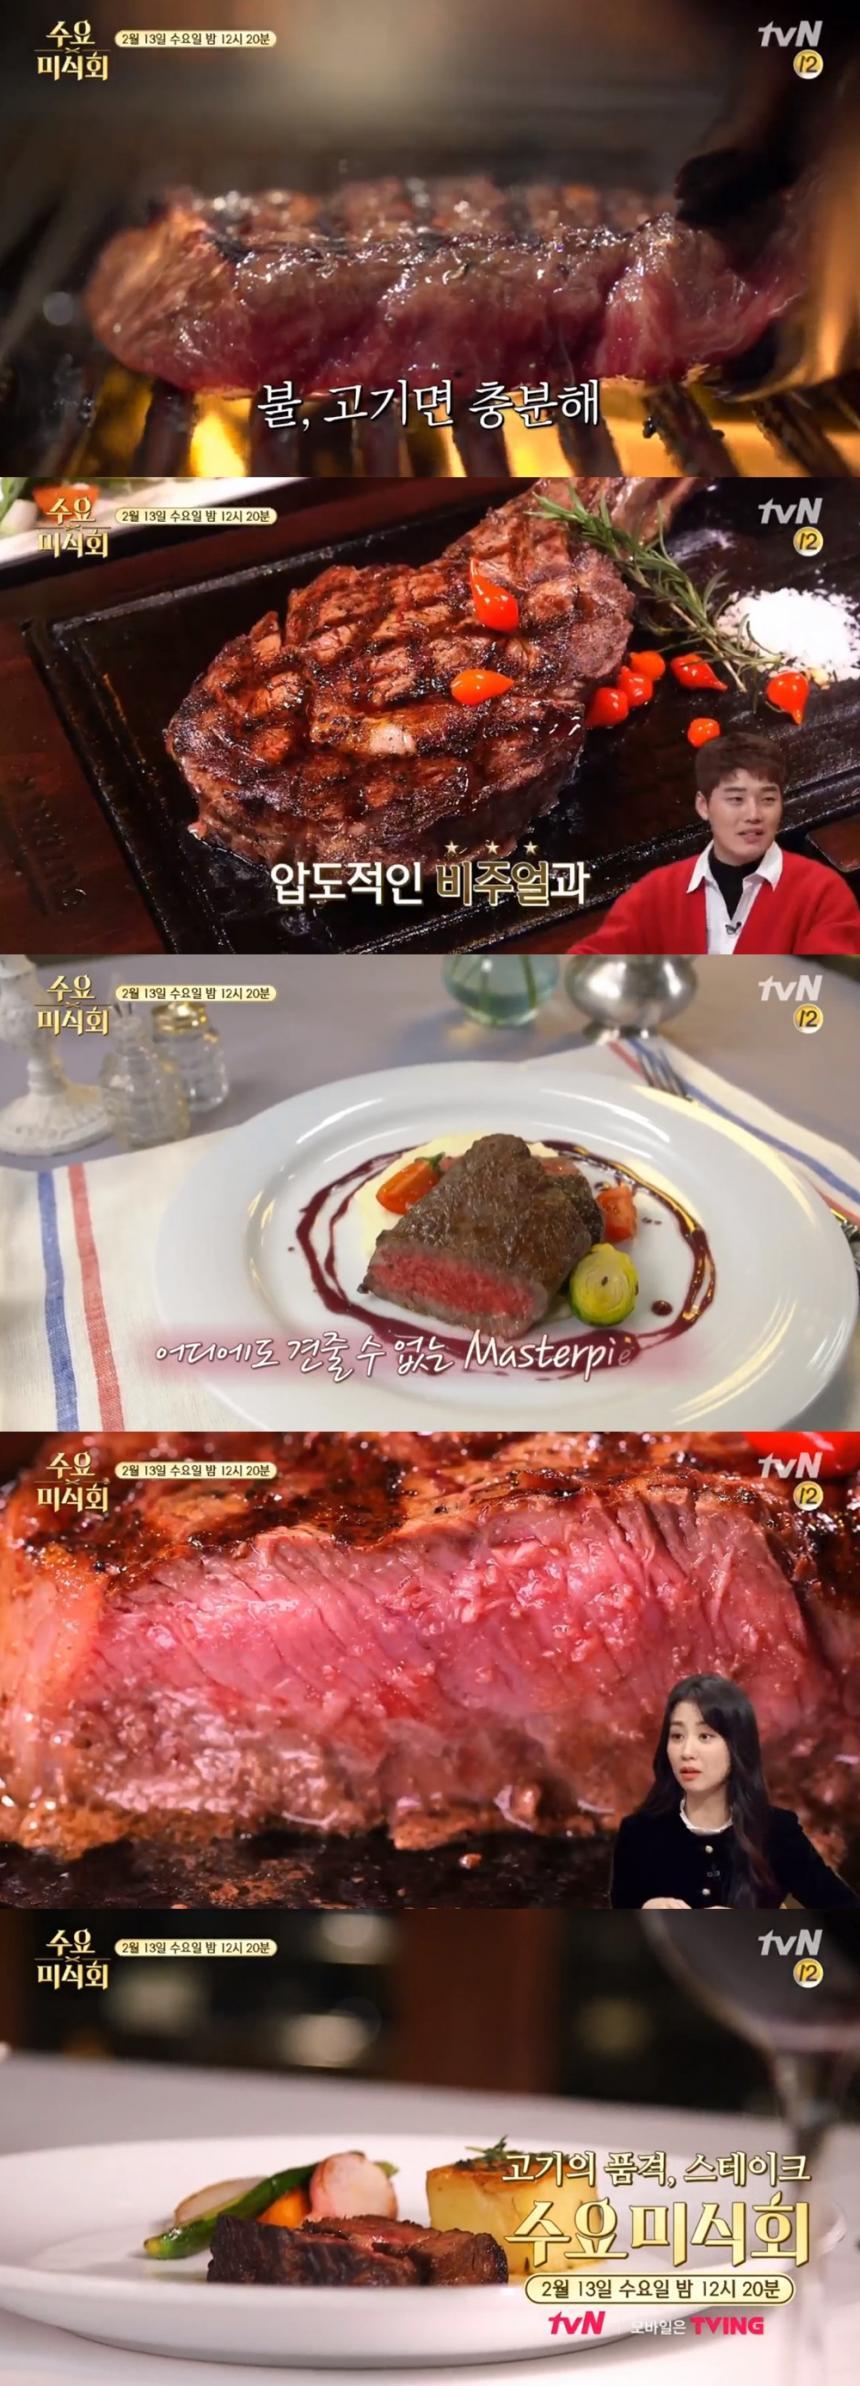 tvN '수요미식회' 예고 캡처